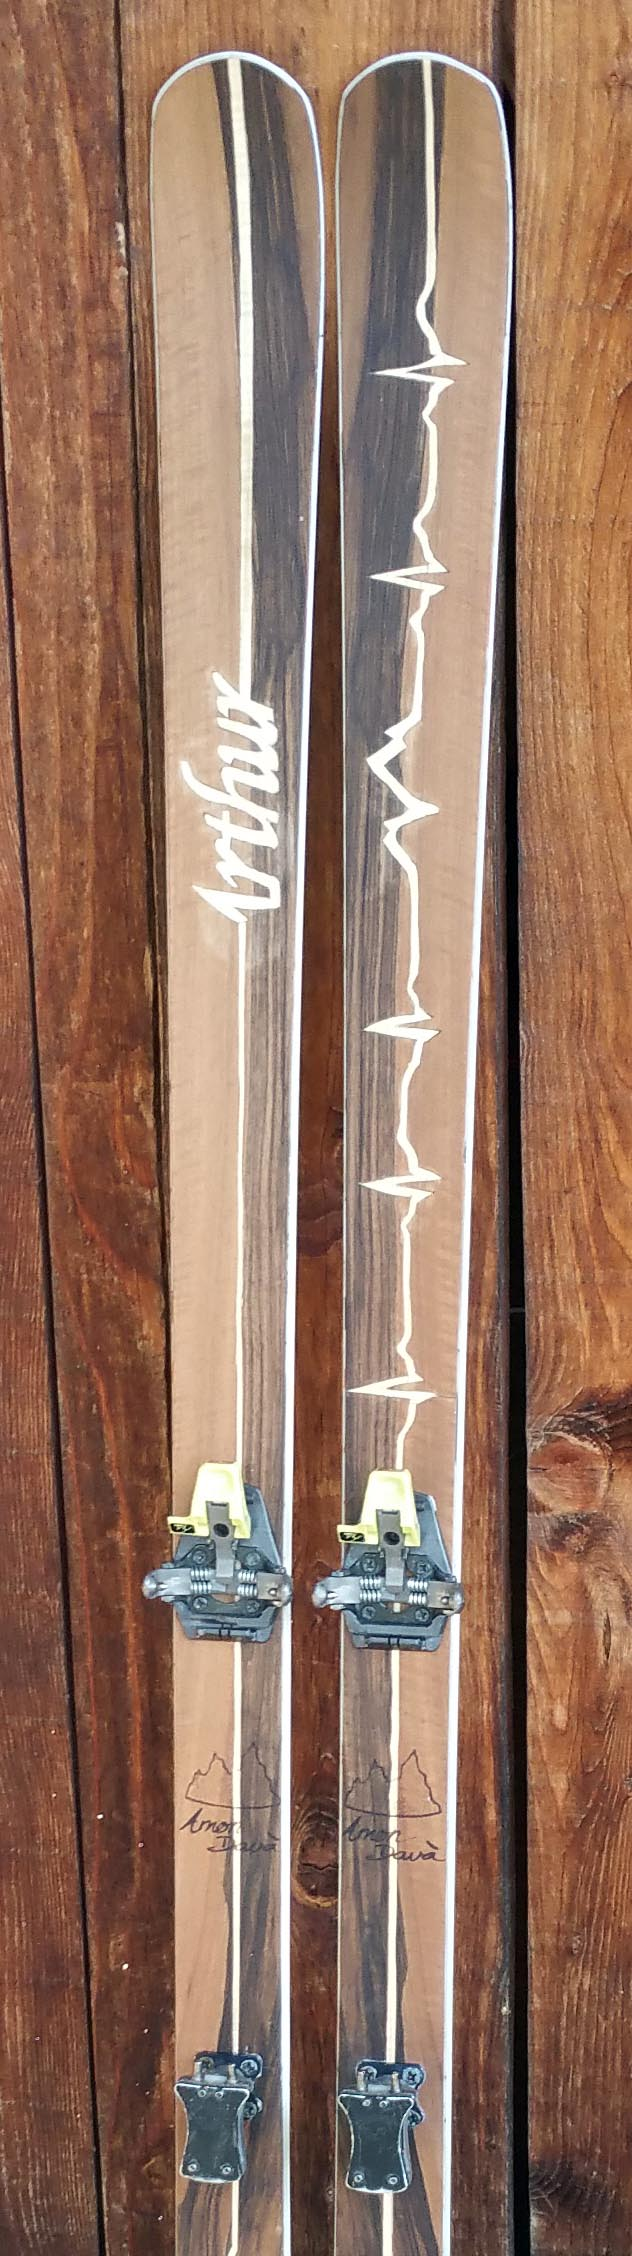 Amon Dava ski bois arthur et lilou